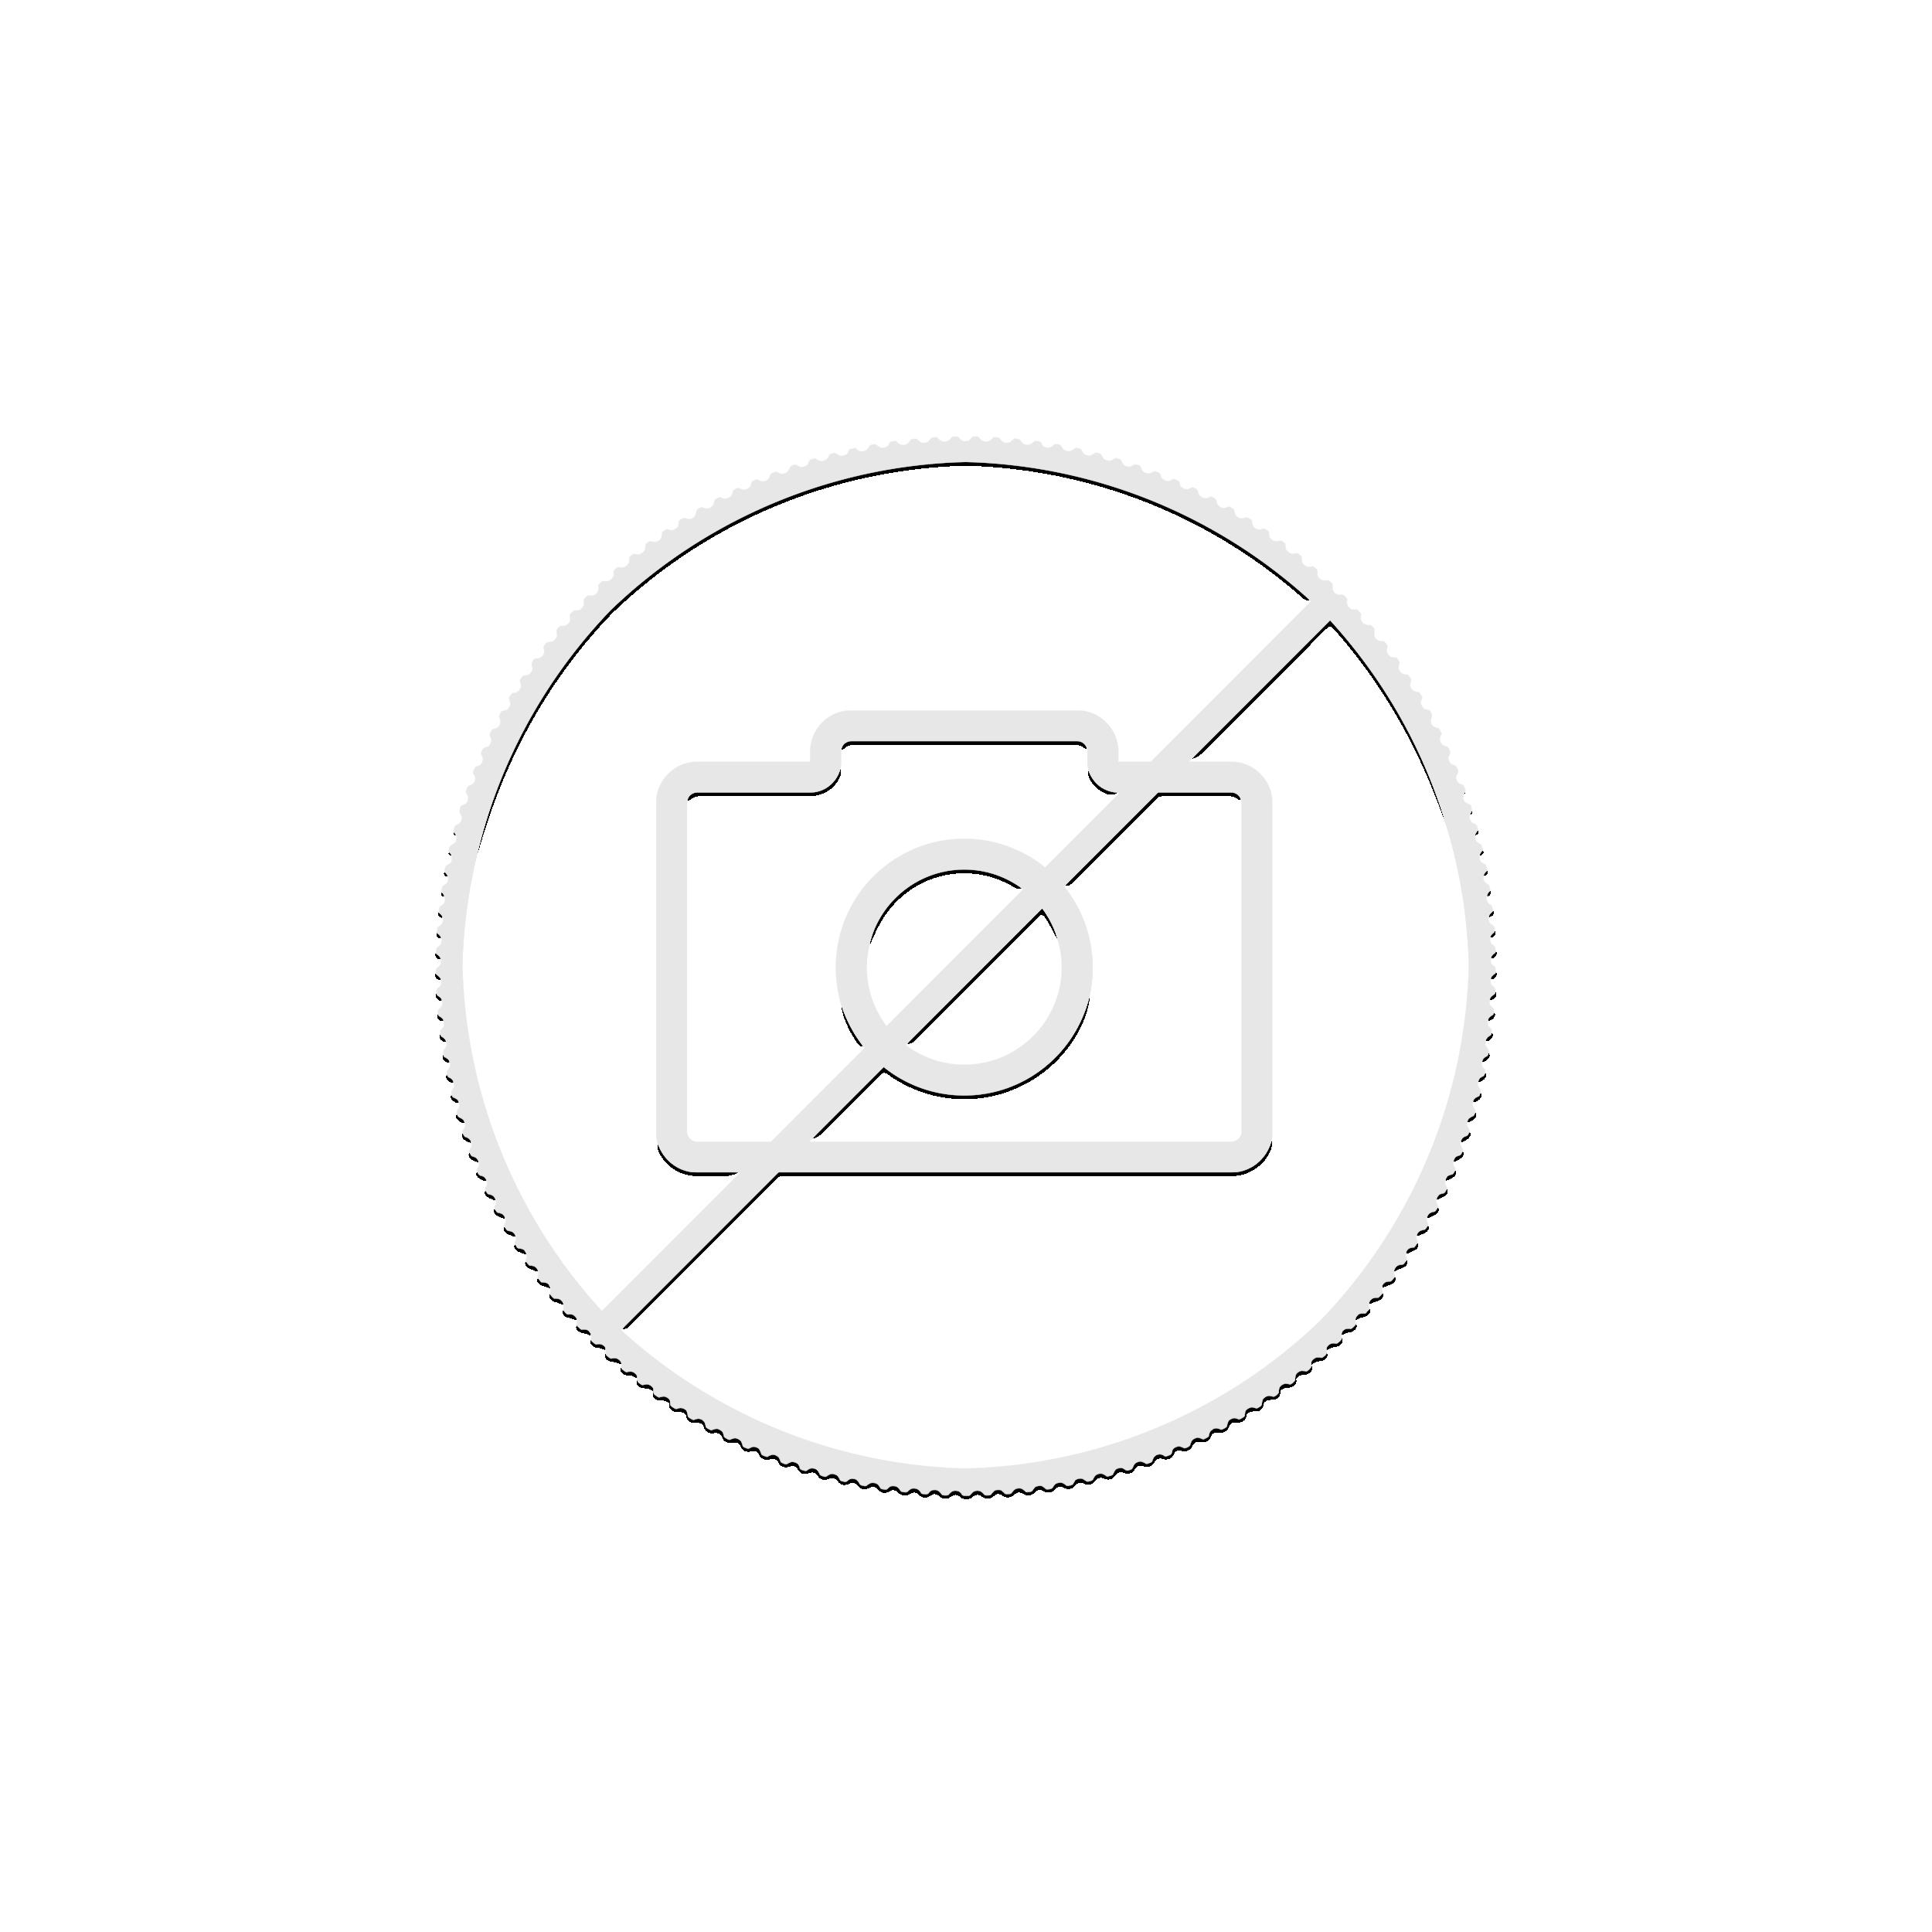 1/2 troy ounce zilveren munt Lunar 2021 Proof